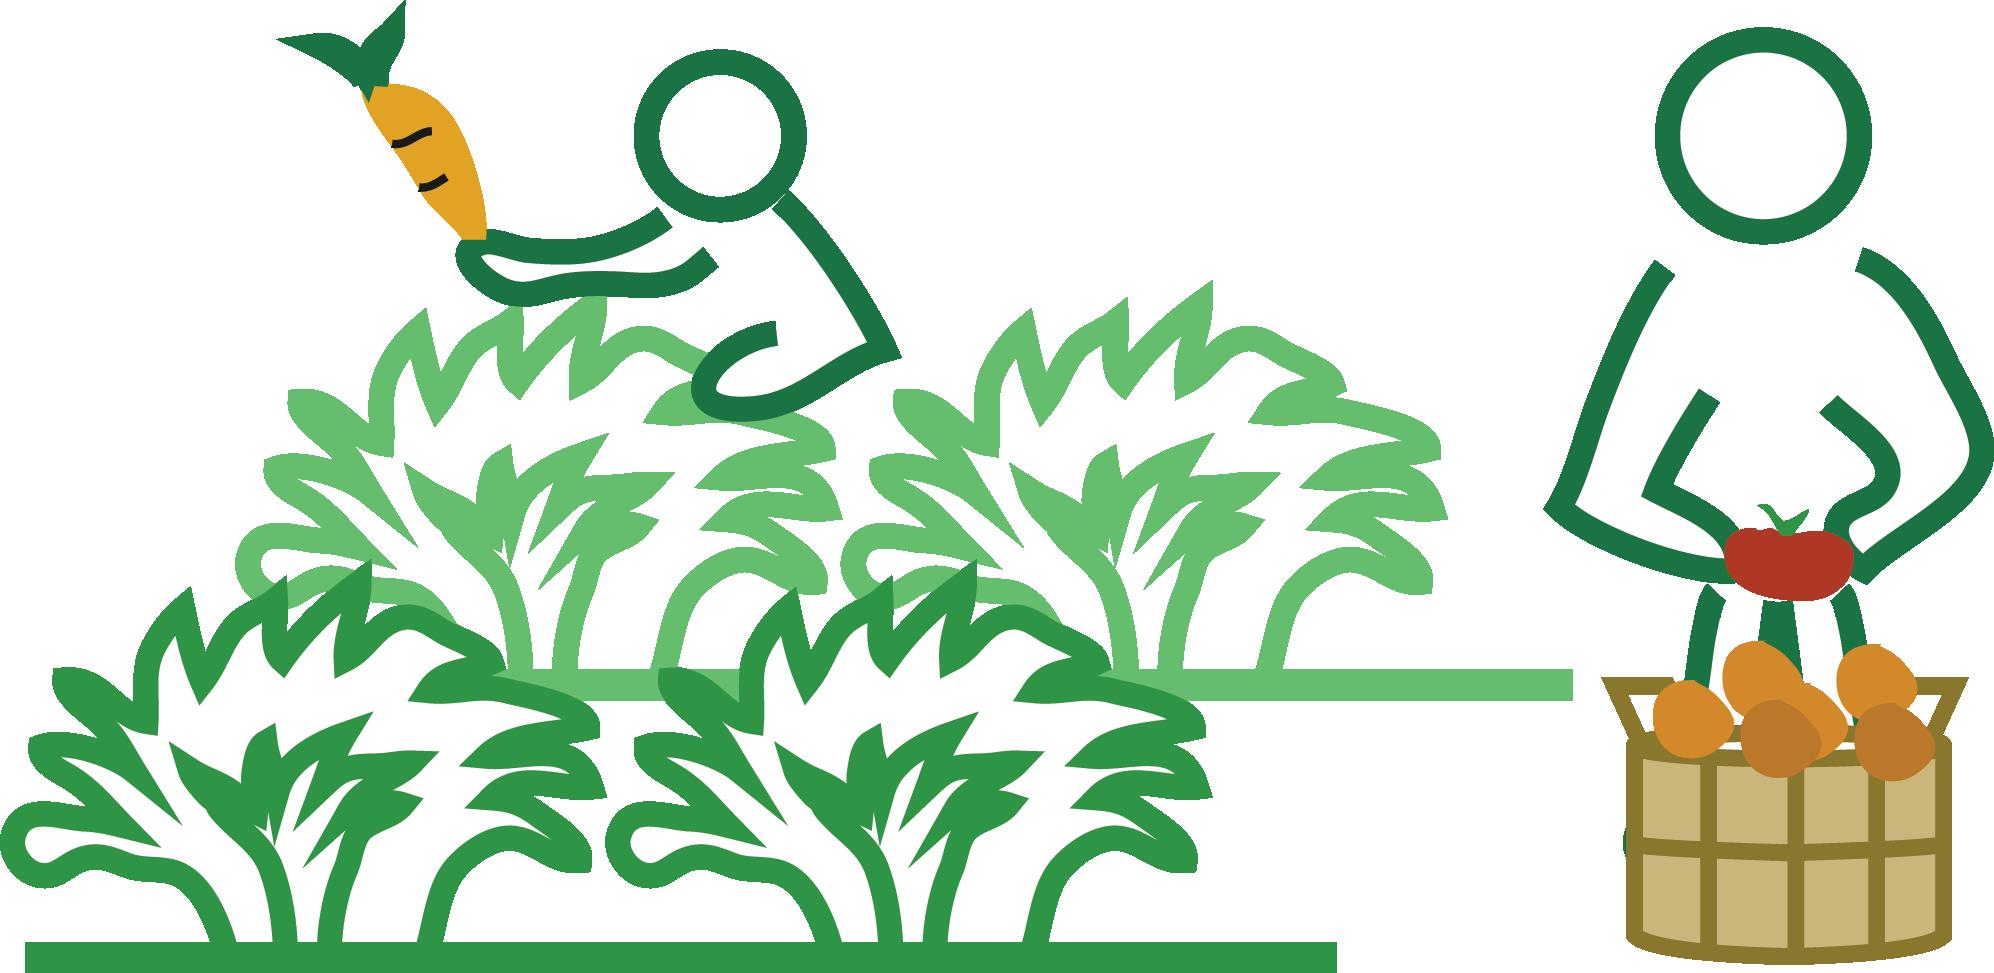 Farmer clipart agricultural science, Farmer agricultural.